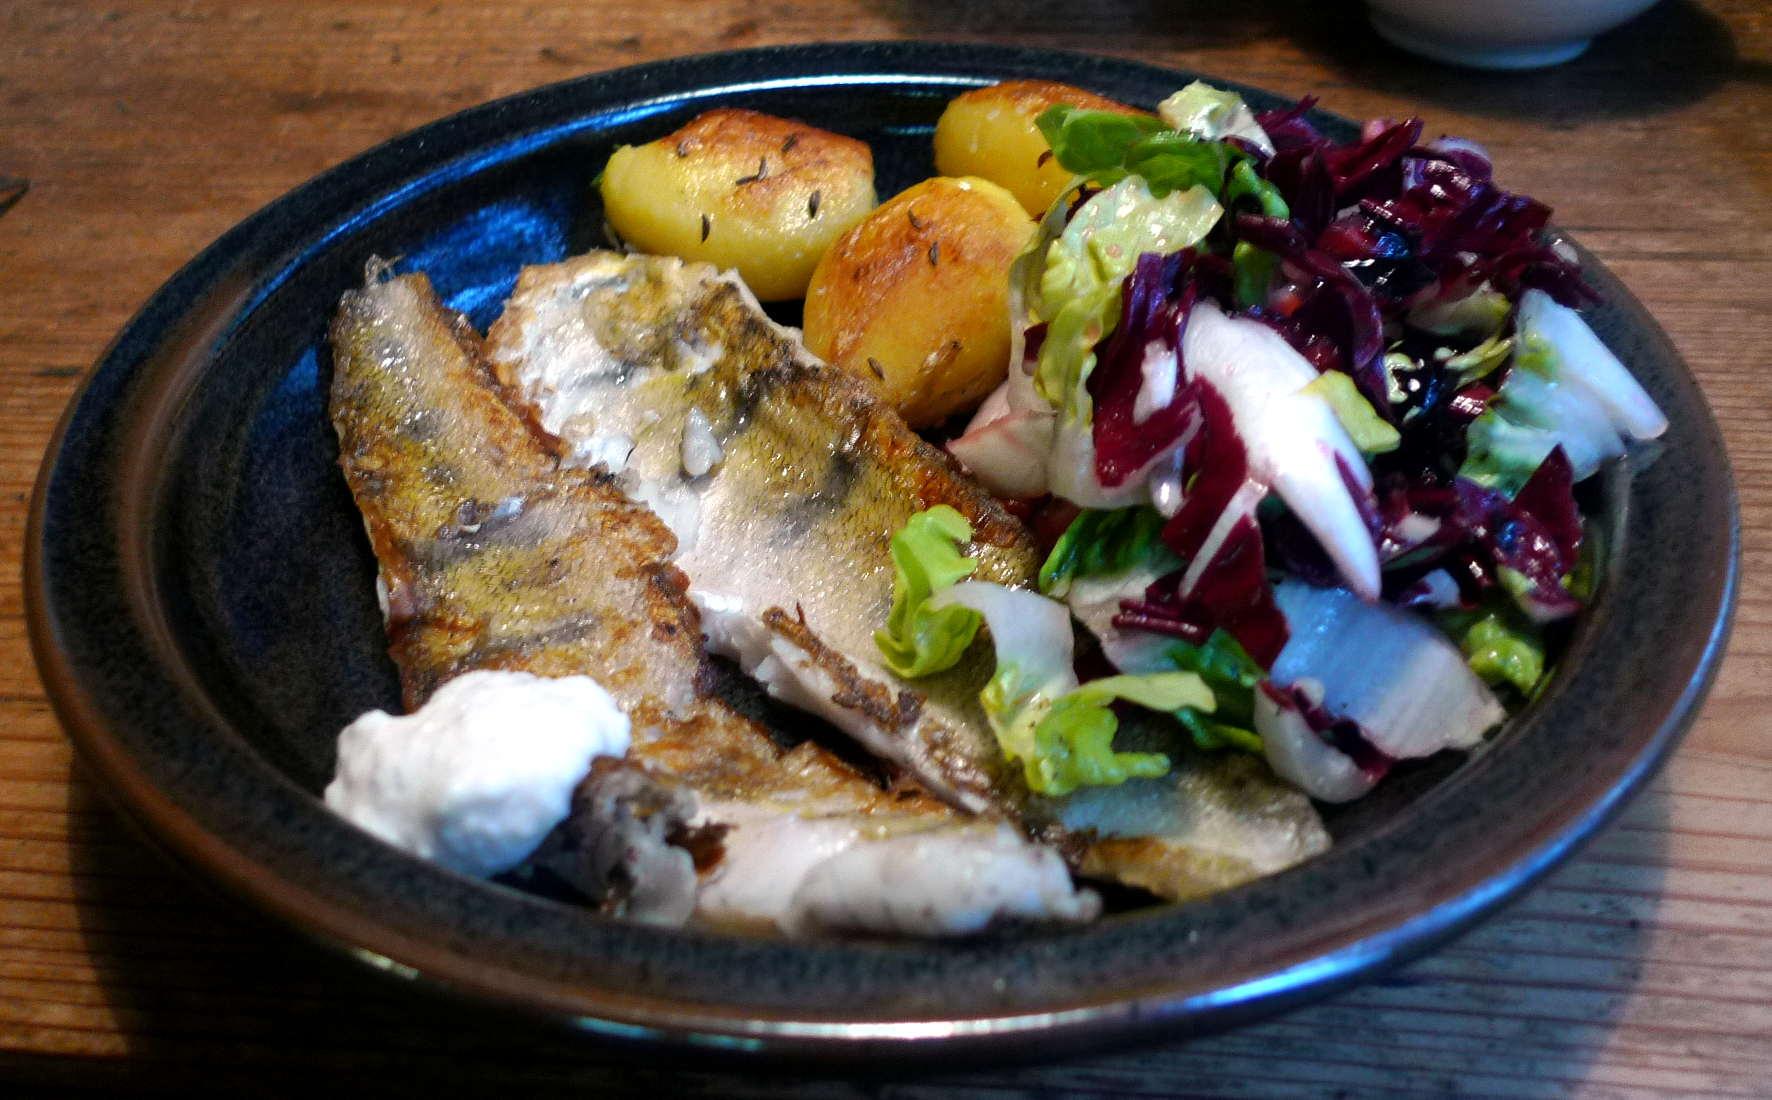 9.2.16 - Zander,Salat,Kartoffel,pescetarisch (1c) (26)